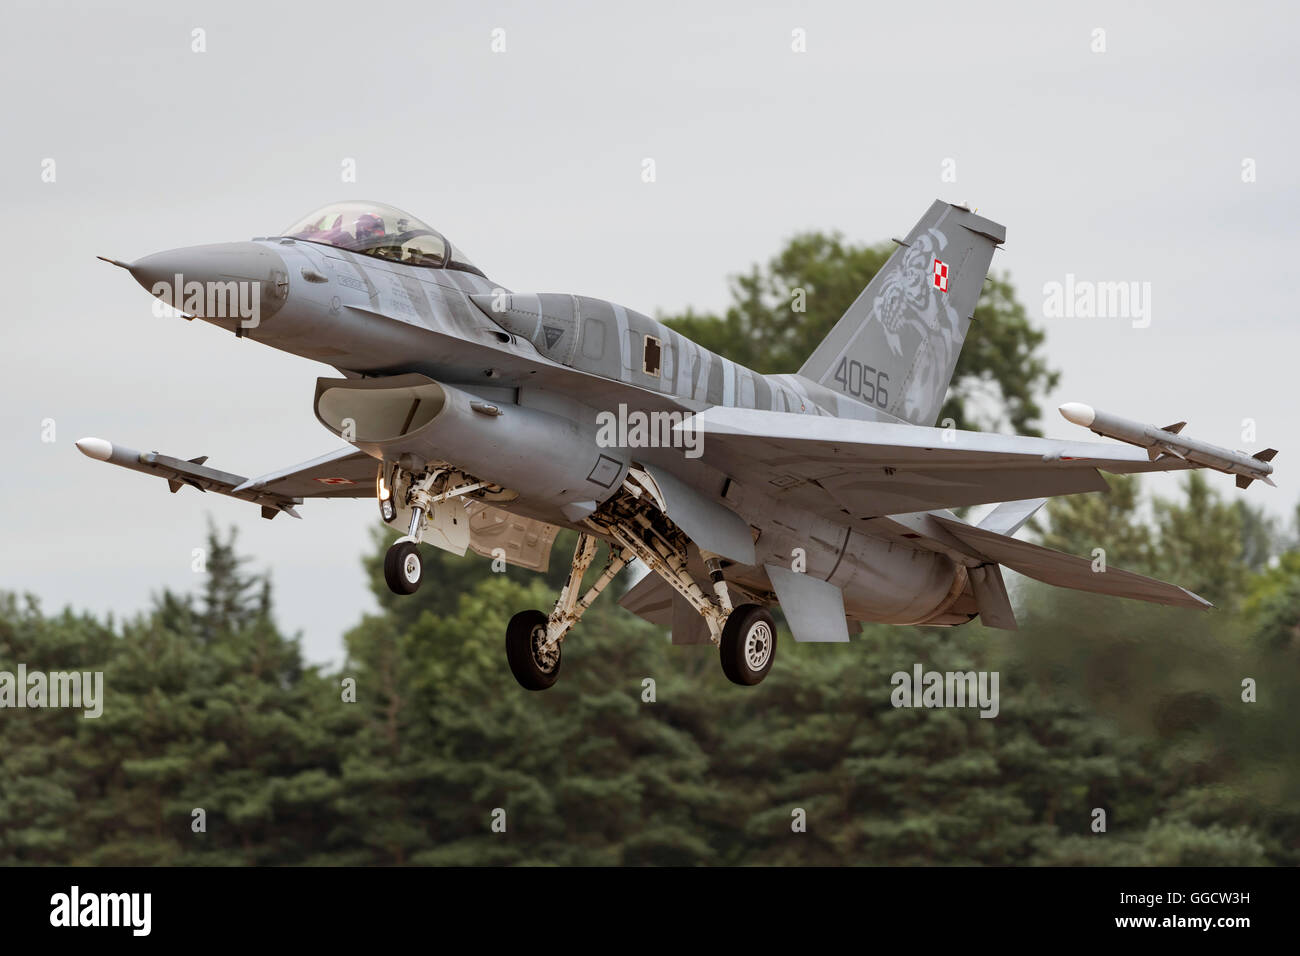 F-16 Fighting Falcon 'Tiger Demo Team' Polish Air Force at the Royal International air Tattoo 2016 - Stock Image